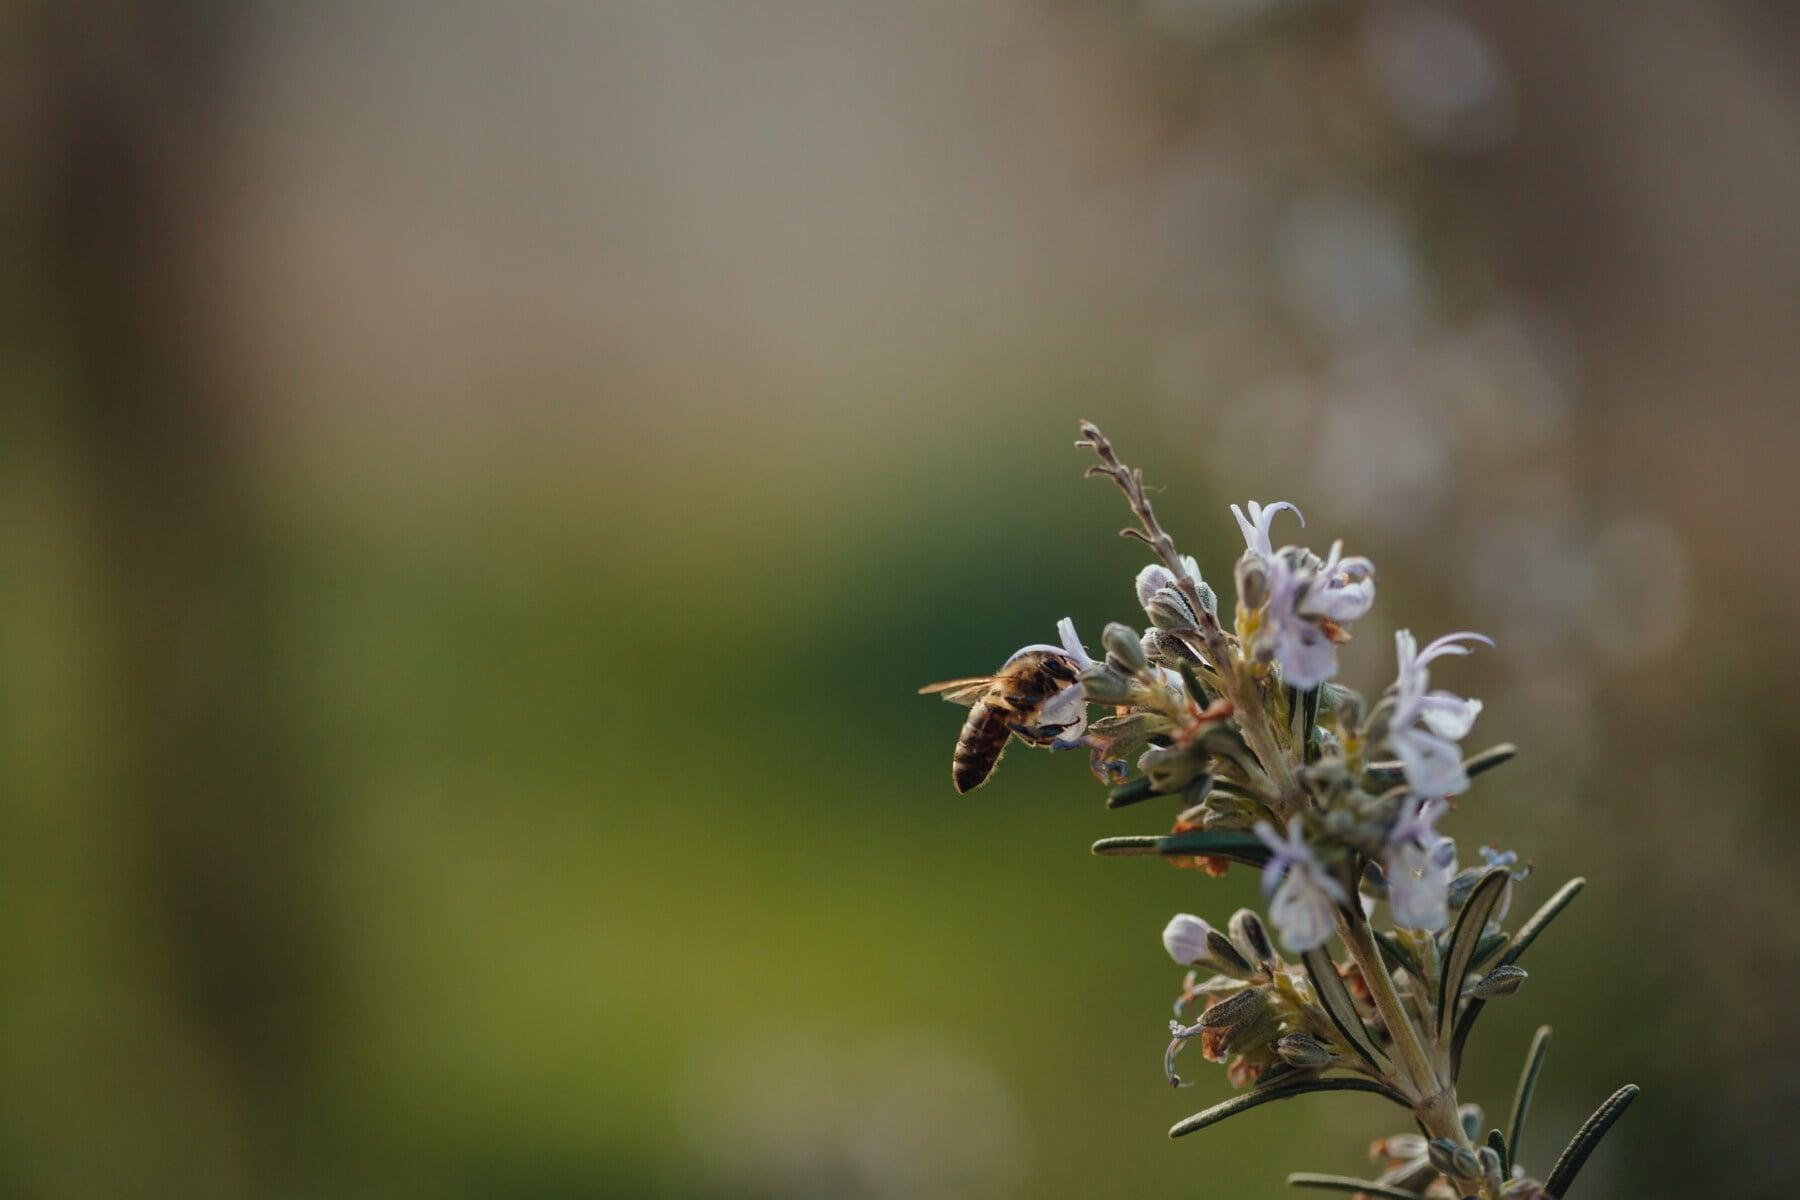 abeille, abeille, jardin fleuri, branches, romarin, branche, nature, arbre, printemps, fleur